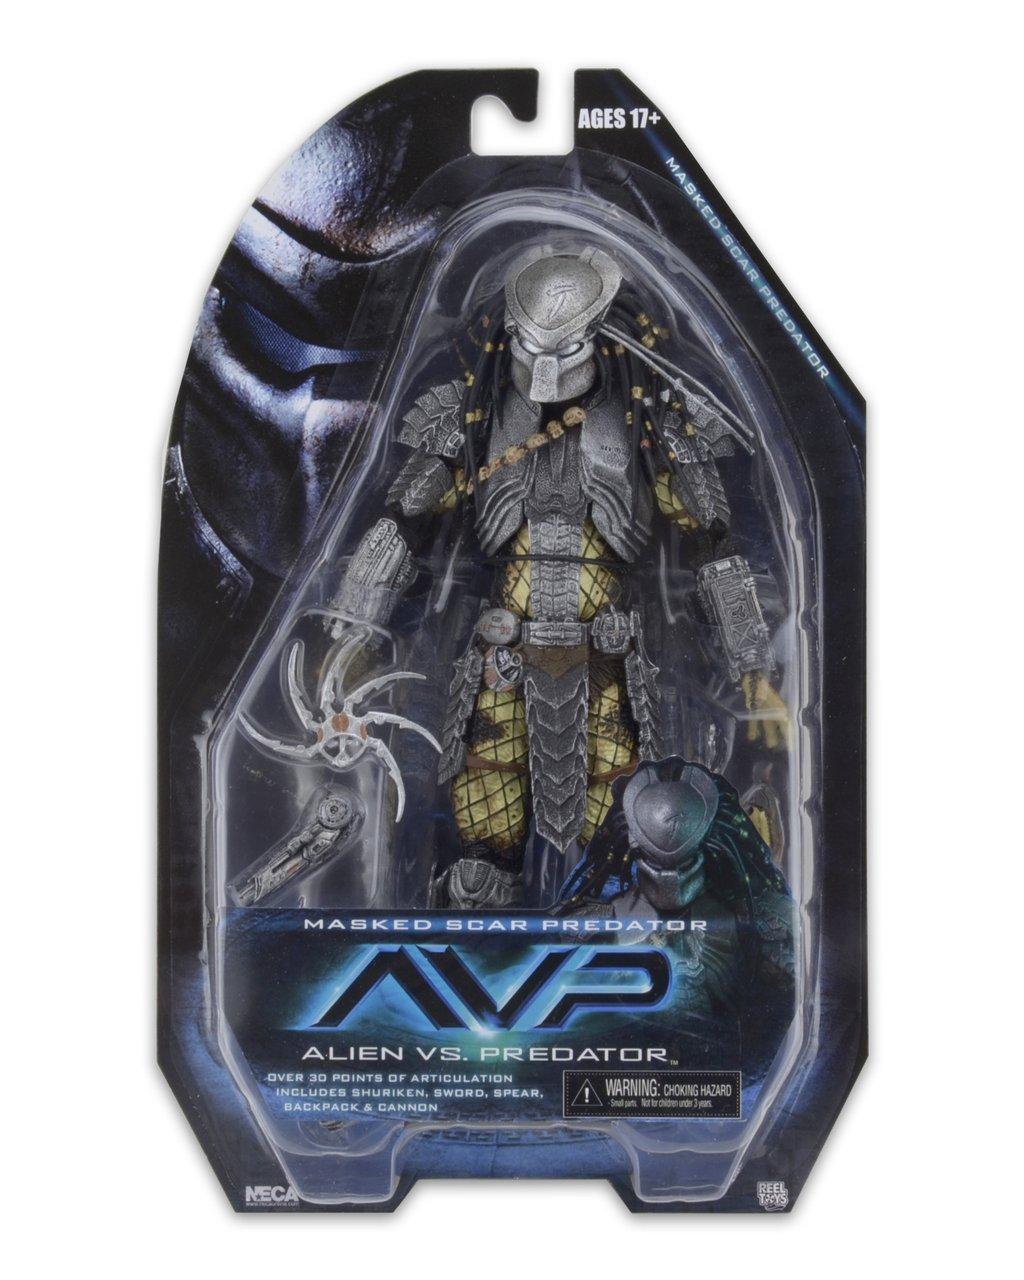 NECA Toys Predator Series 15 Masked Scar Predator & Warrior Predator In Package Images